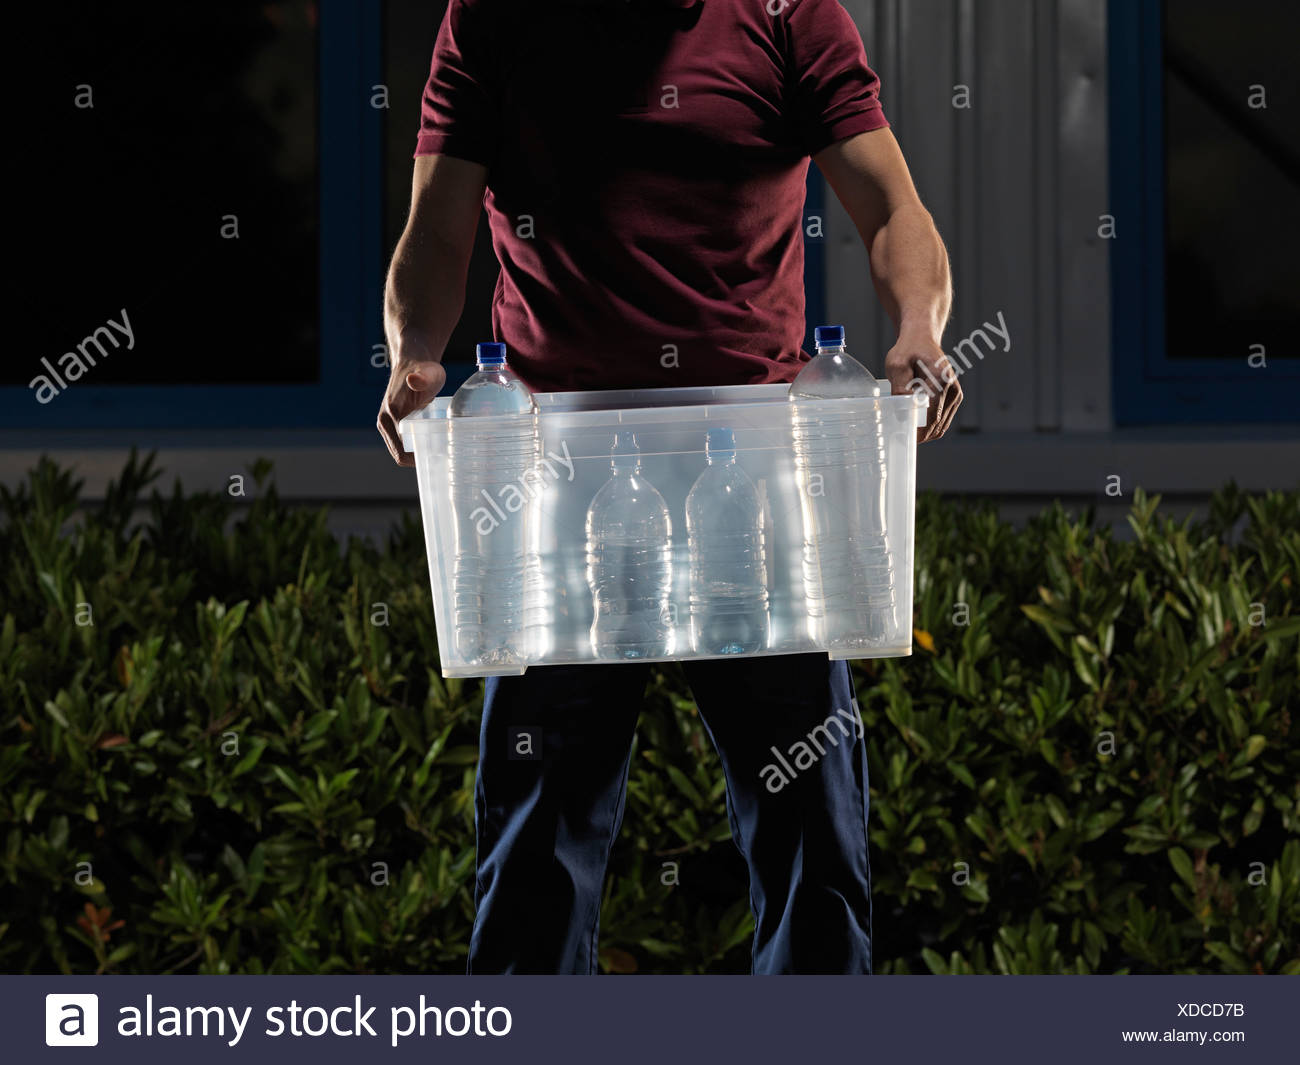 man carrying box of water at night - Stock Image